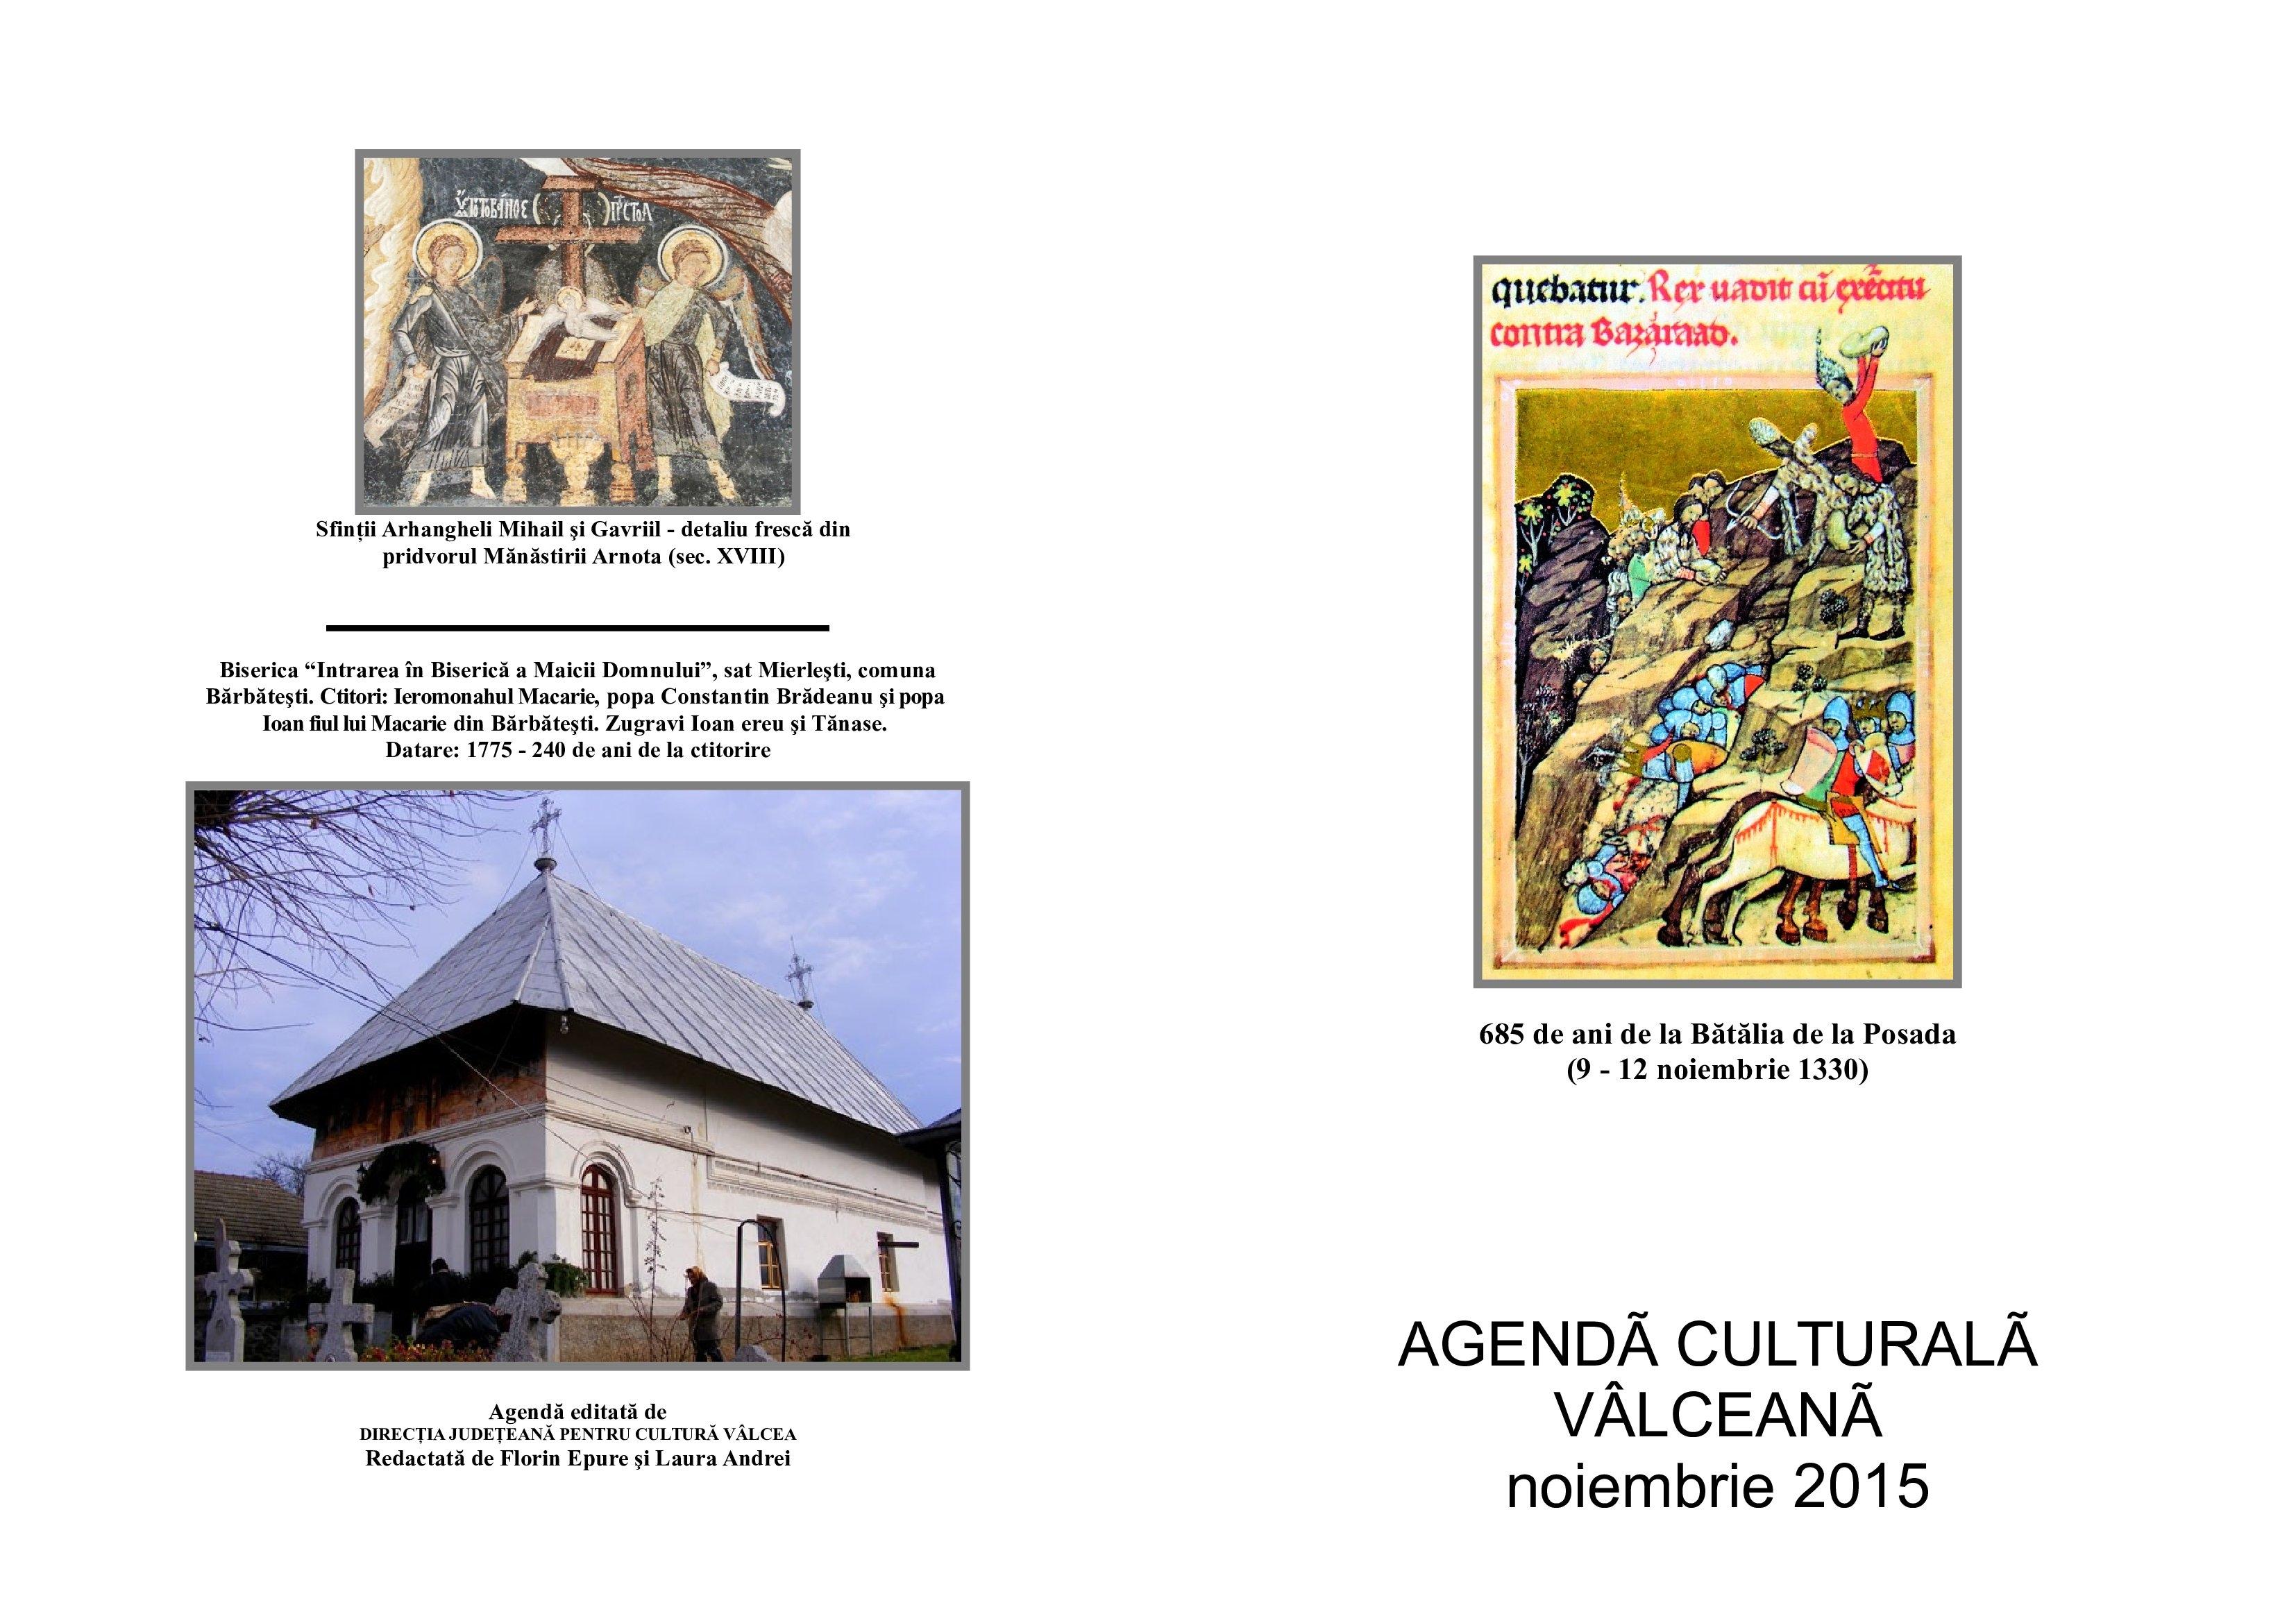 Agenda Culturala Valceana, noiembrie 2015